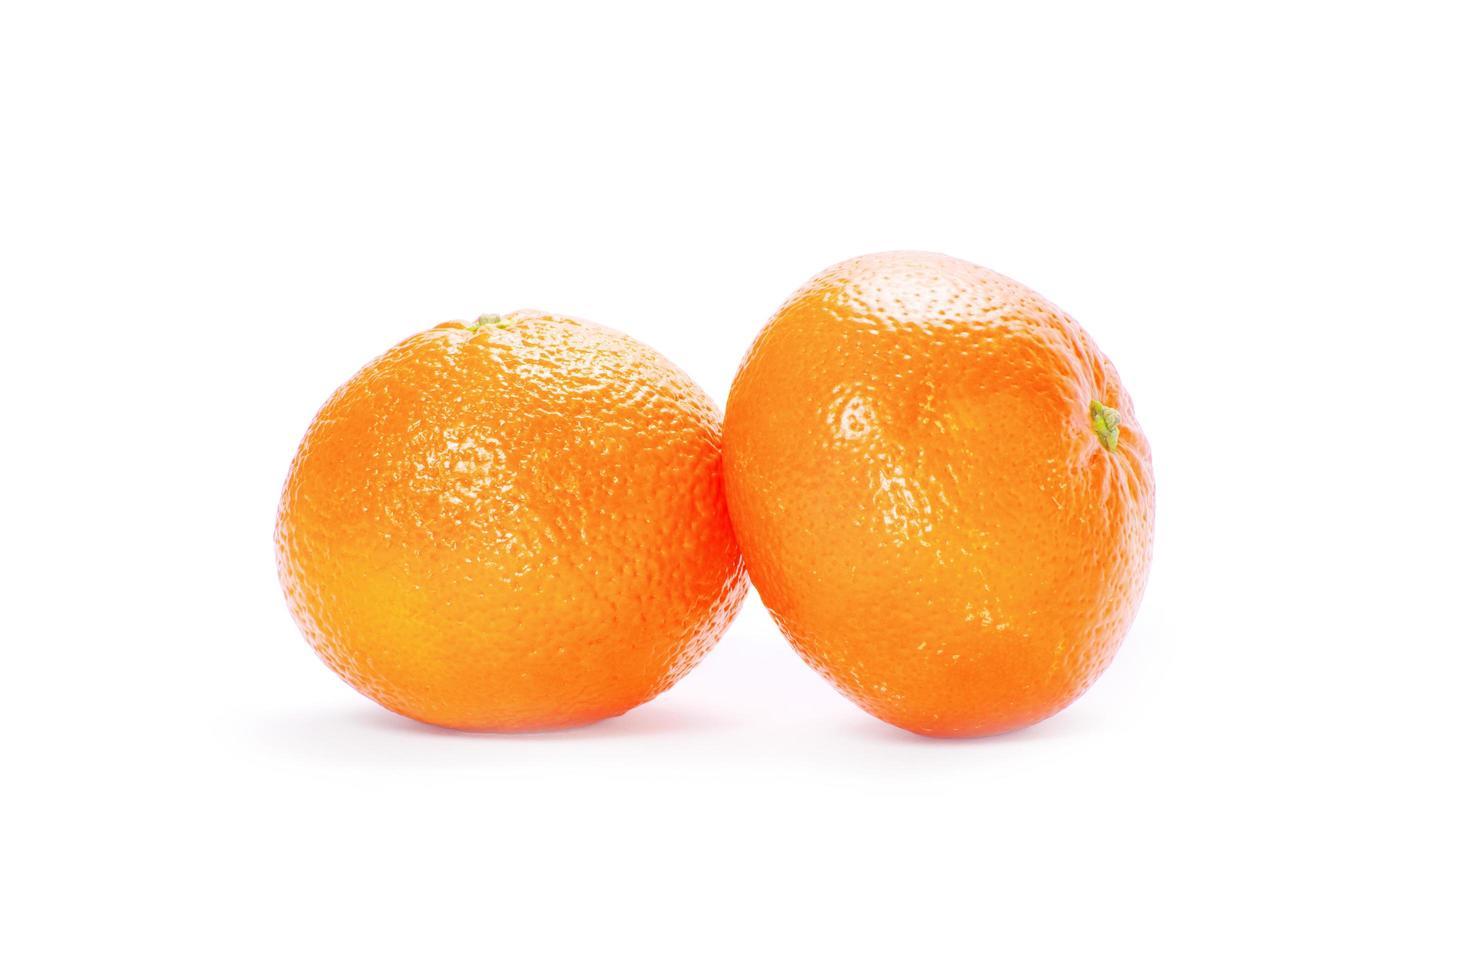 mandarine isolé sur fond blanc photo